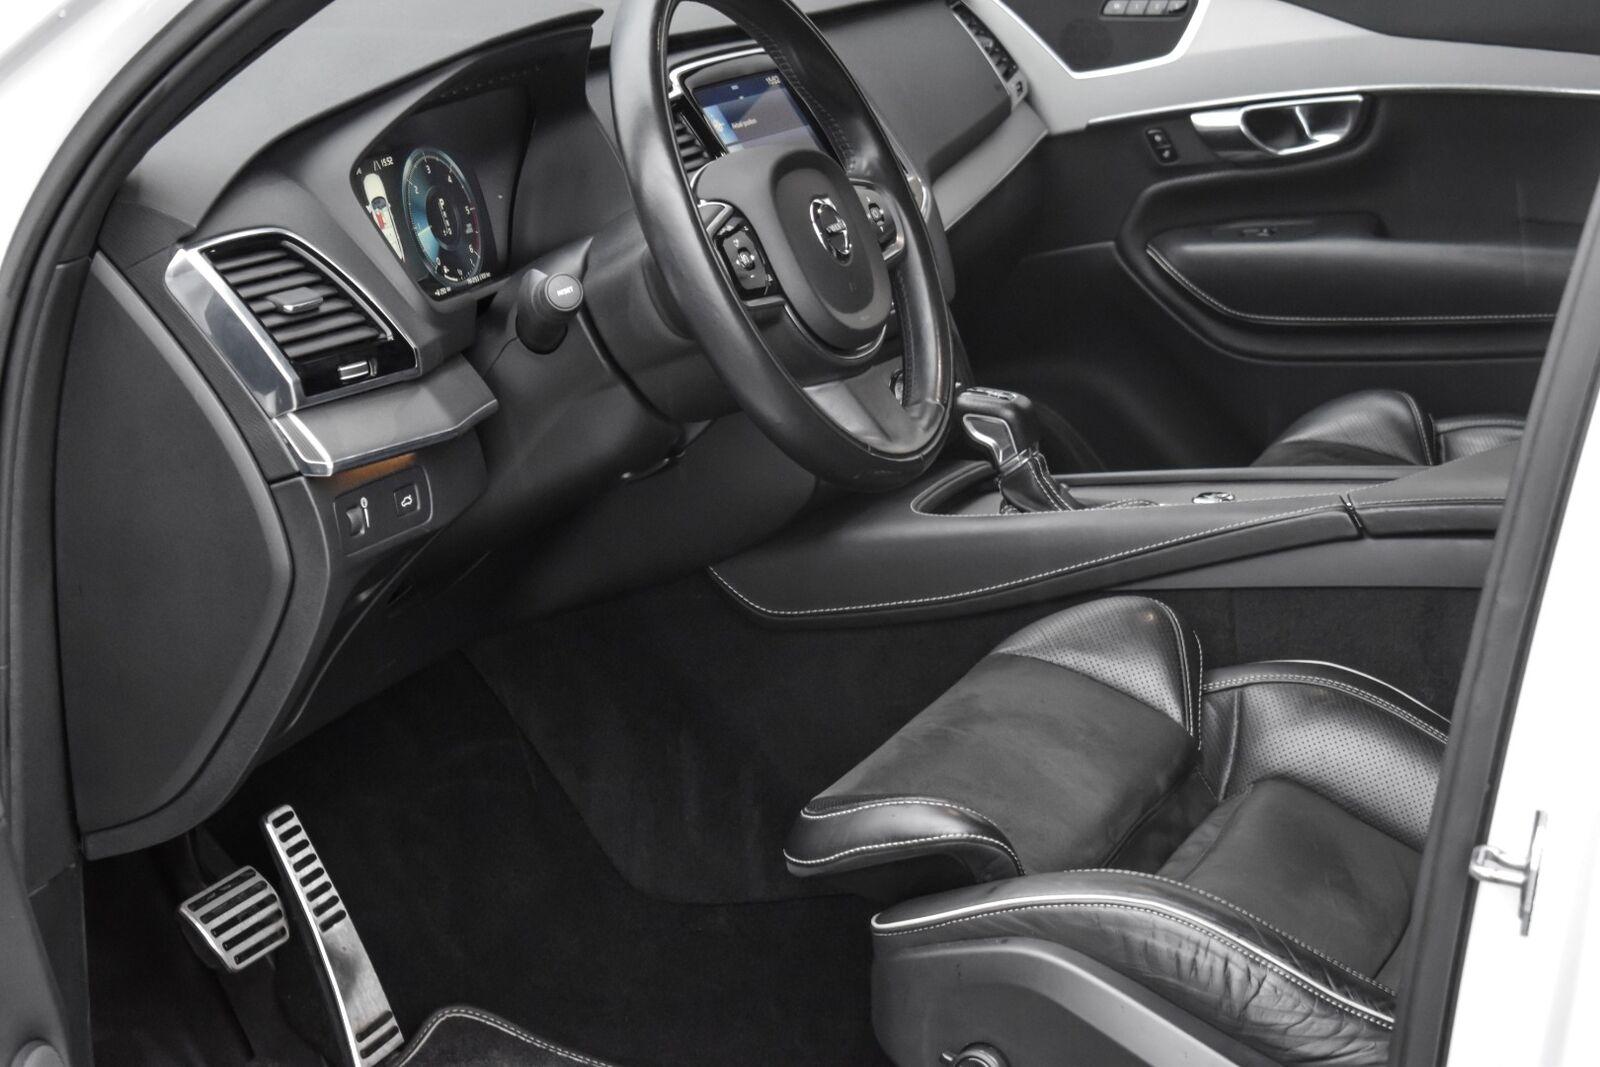 Volvo XC90 2,0 D5 225 R-Design aut. AWD 7prs - billede 8